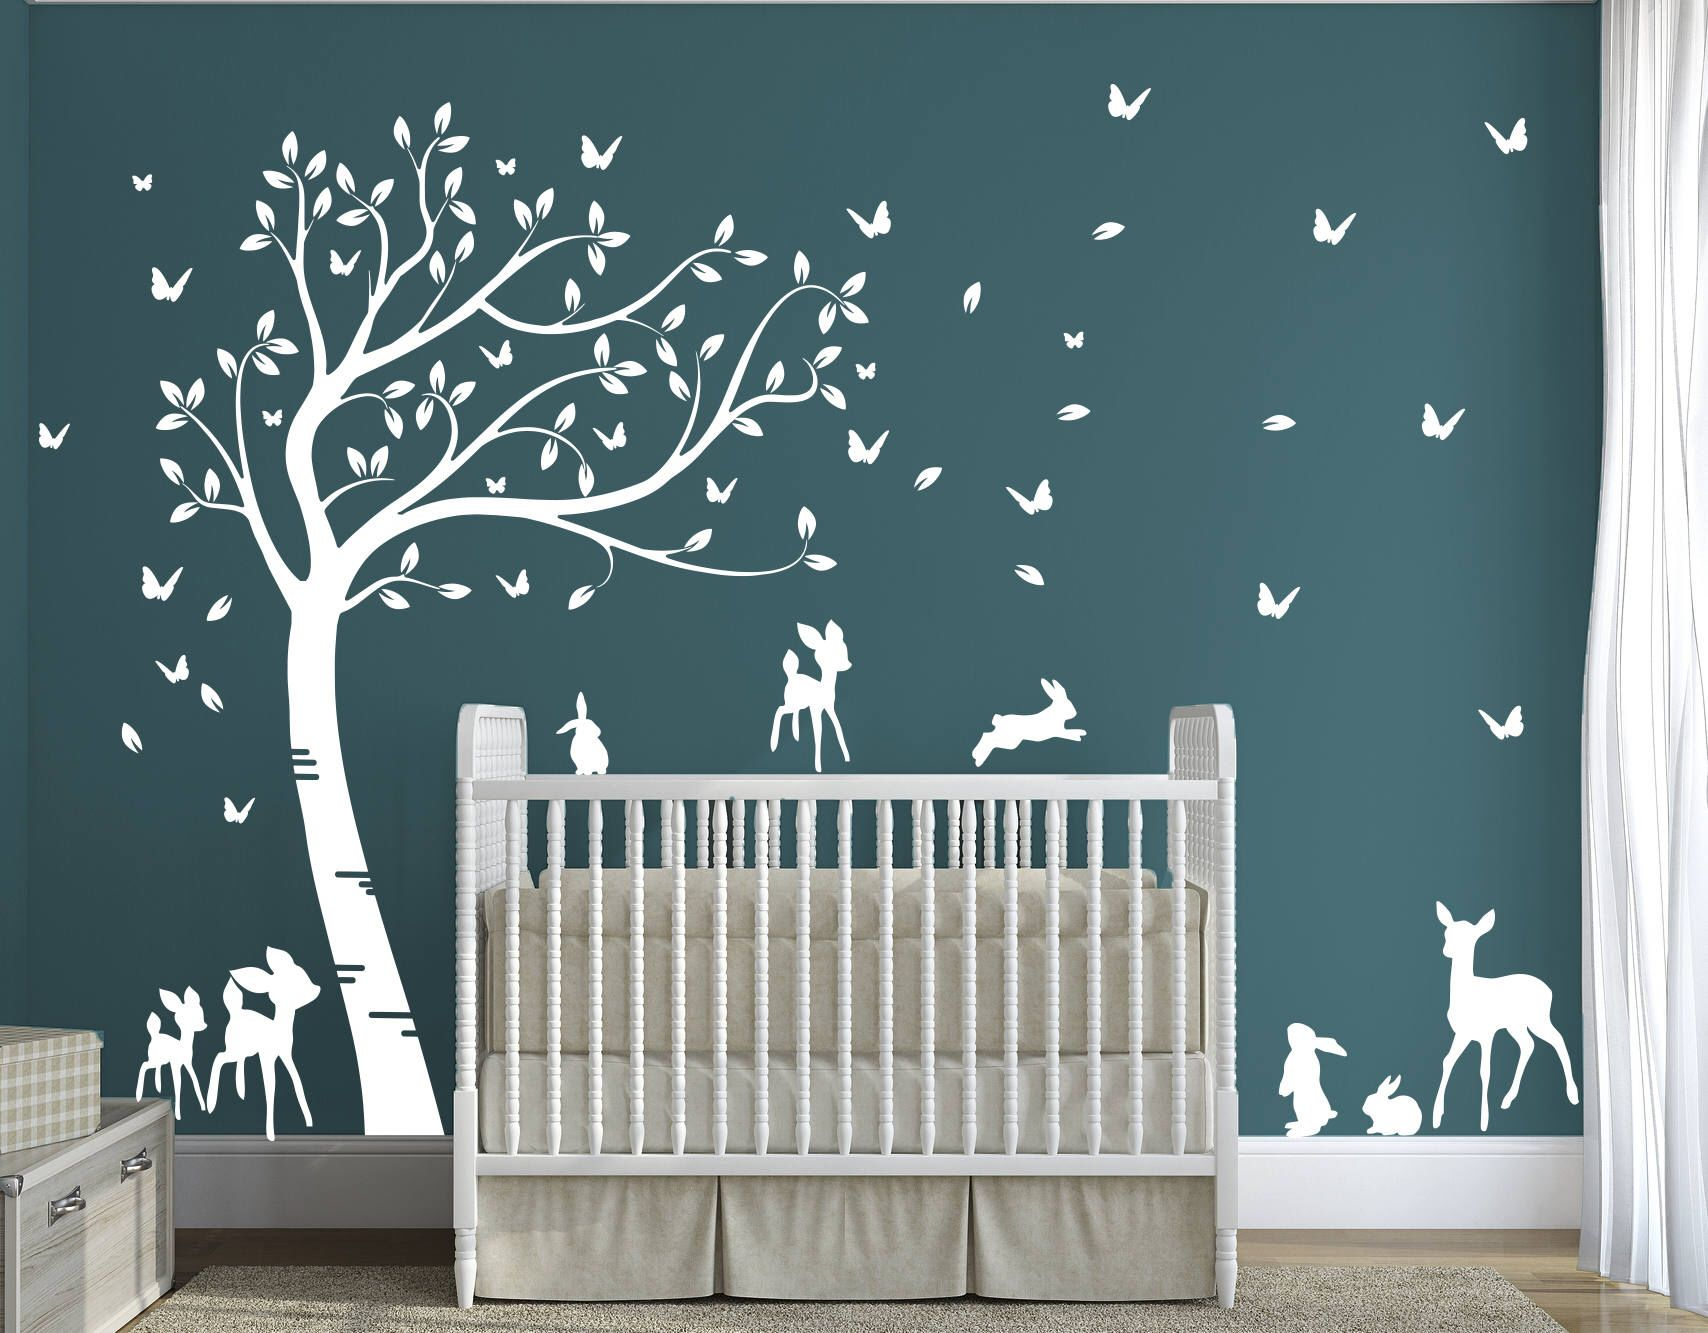 Sticker Mural Foret Bebe Ecureuil Accrochez Vous Kinderzimmer